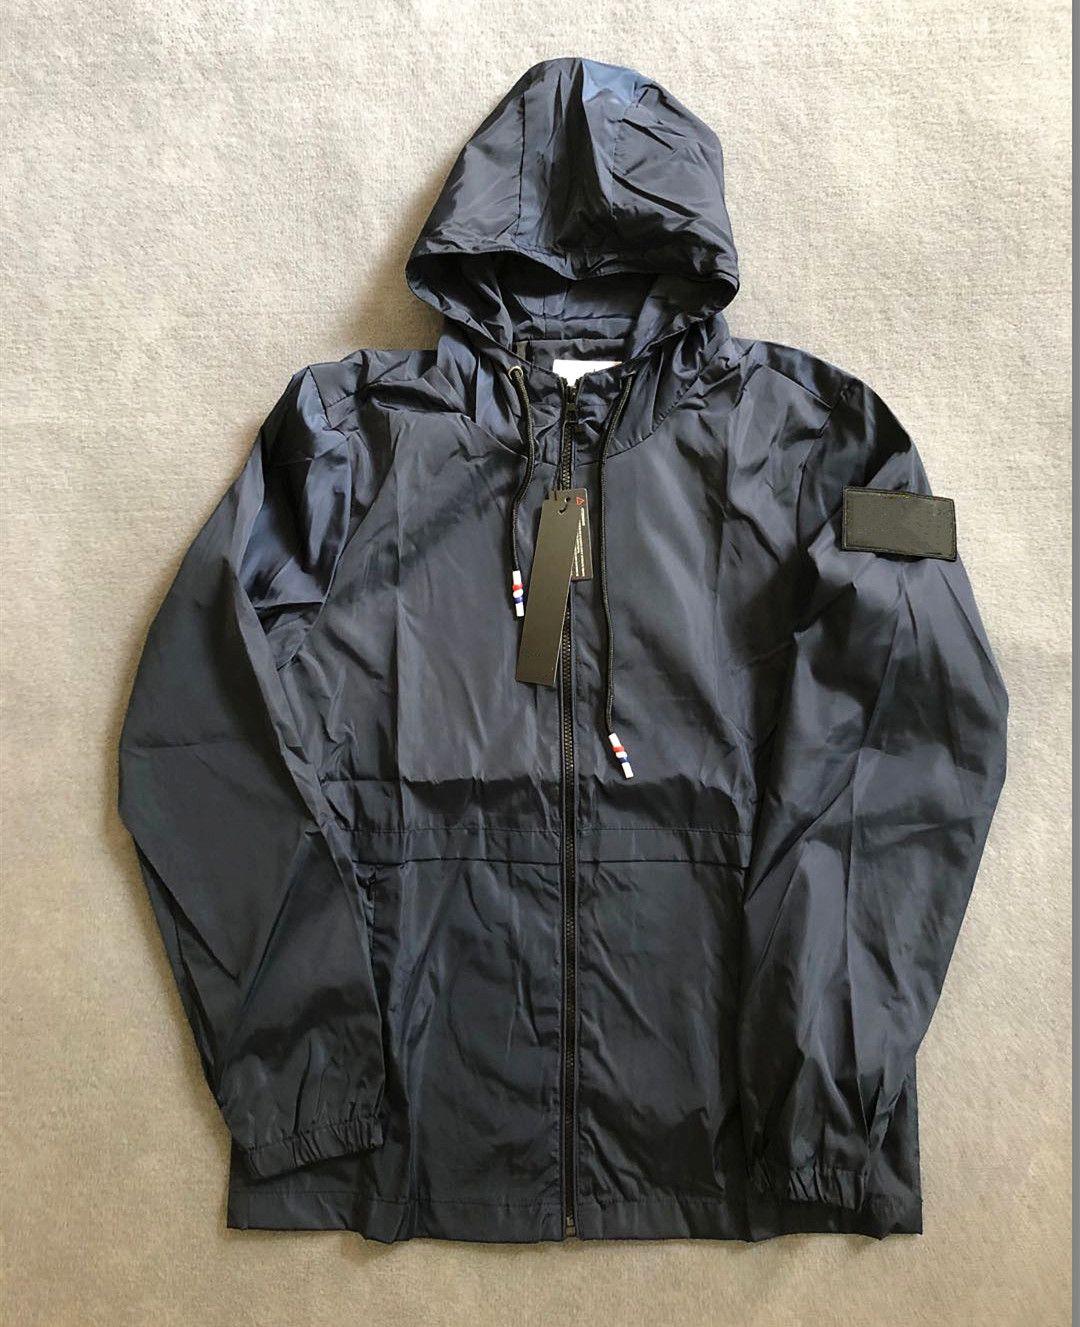 Mens Jacket Coat 가을 Windrunner 자켓 브랜드 스포츠 윈드 브레이커 캐주얼 자켓 남성 탑스 의류 새로운